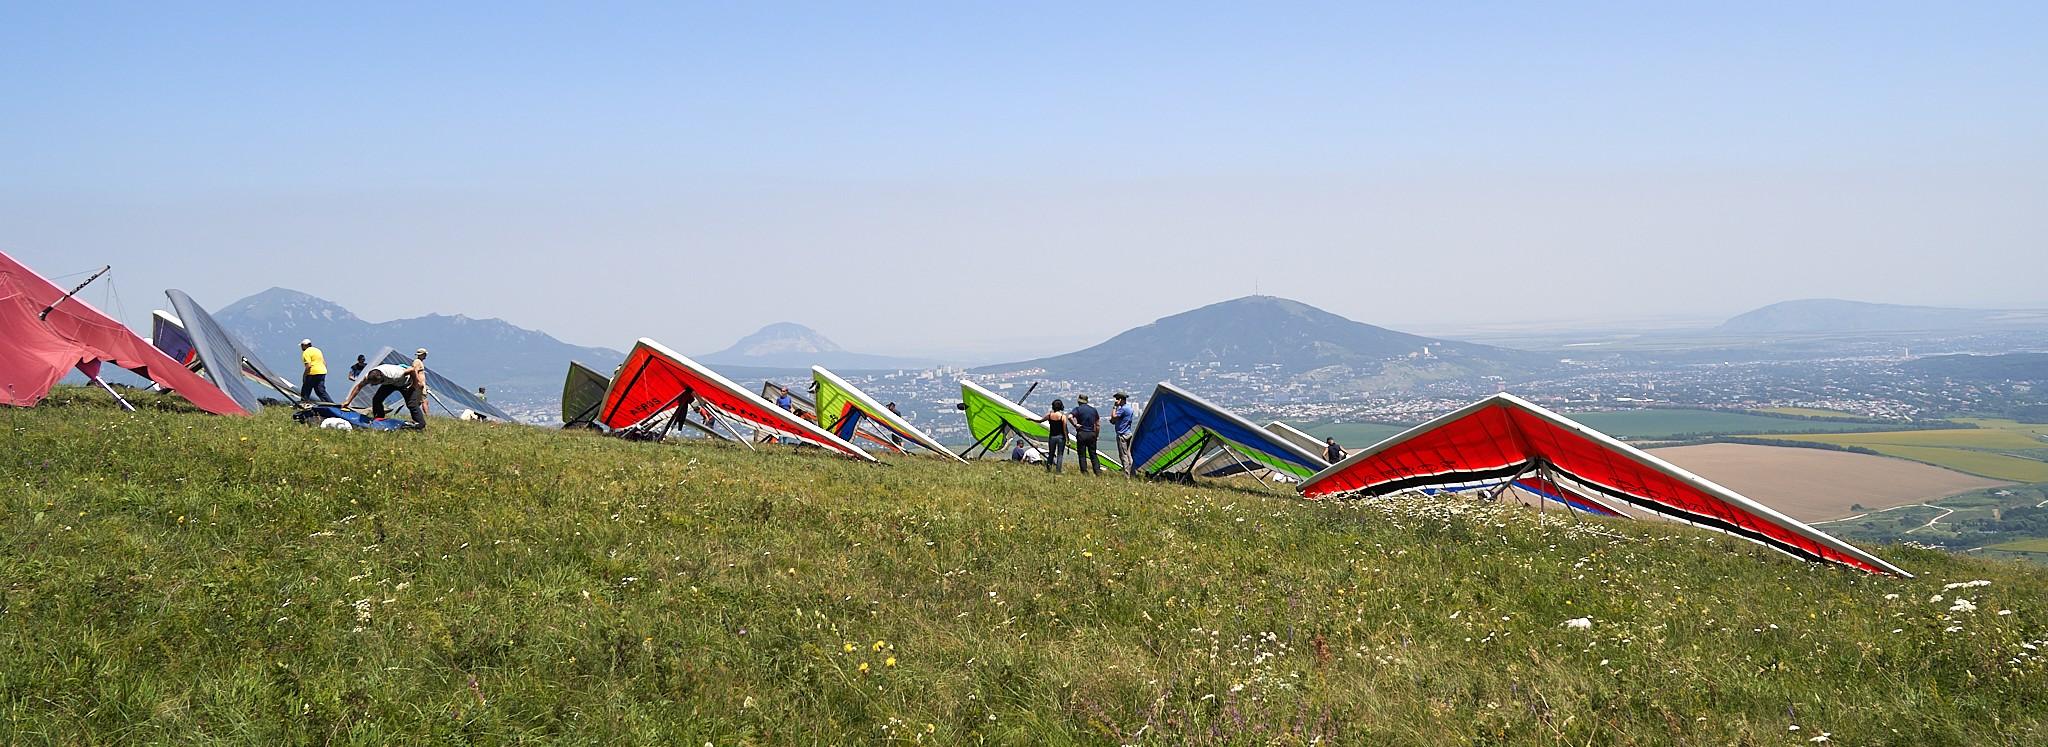 Hang gliders at the Russsian Cup'21 in Yutsa ~ Дельтапланы на Кубке России'21 на Юце